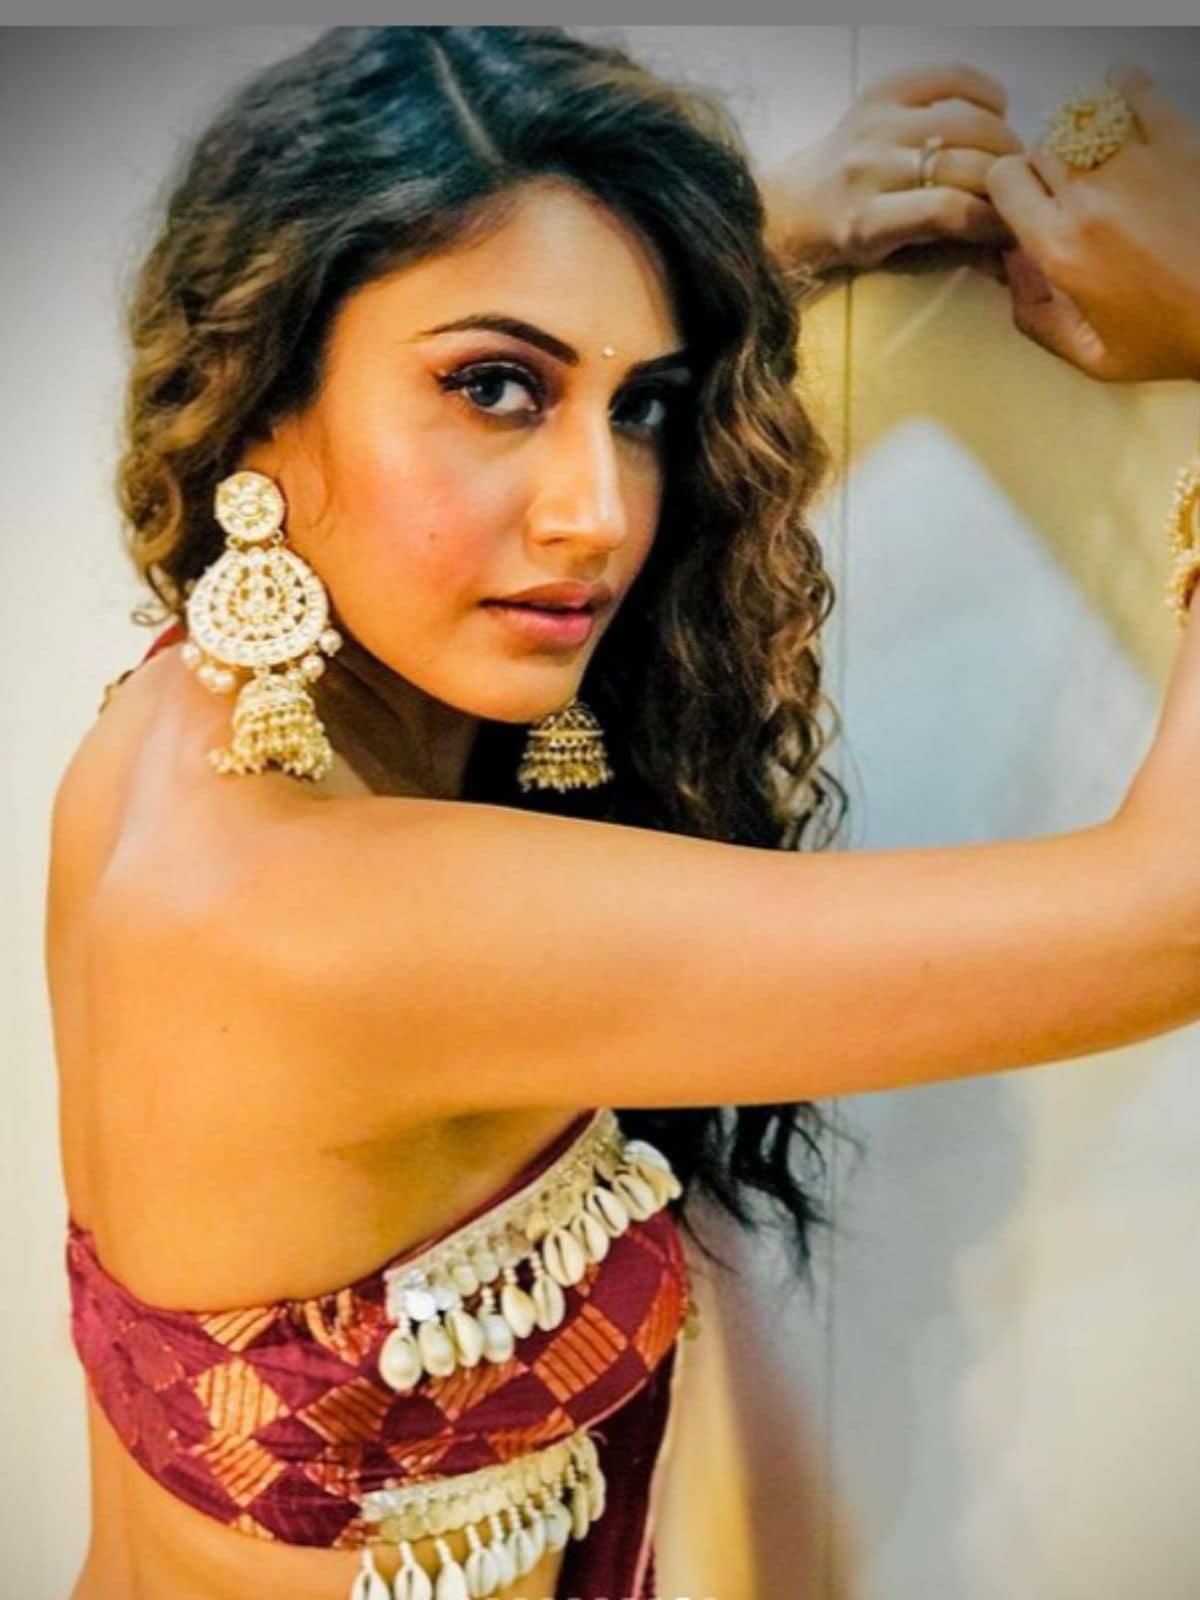 Naagin 5, Surabhi Chandna, Surabhi Chandana New Look, Social Media, Nagin, TV Serial Nagin, Colors TV, सुरभि चंदना, सुरभि चंदना नया लुक, सोशल मीडिया, नागिन, News18 Hindi